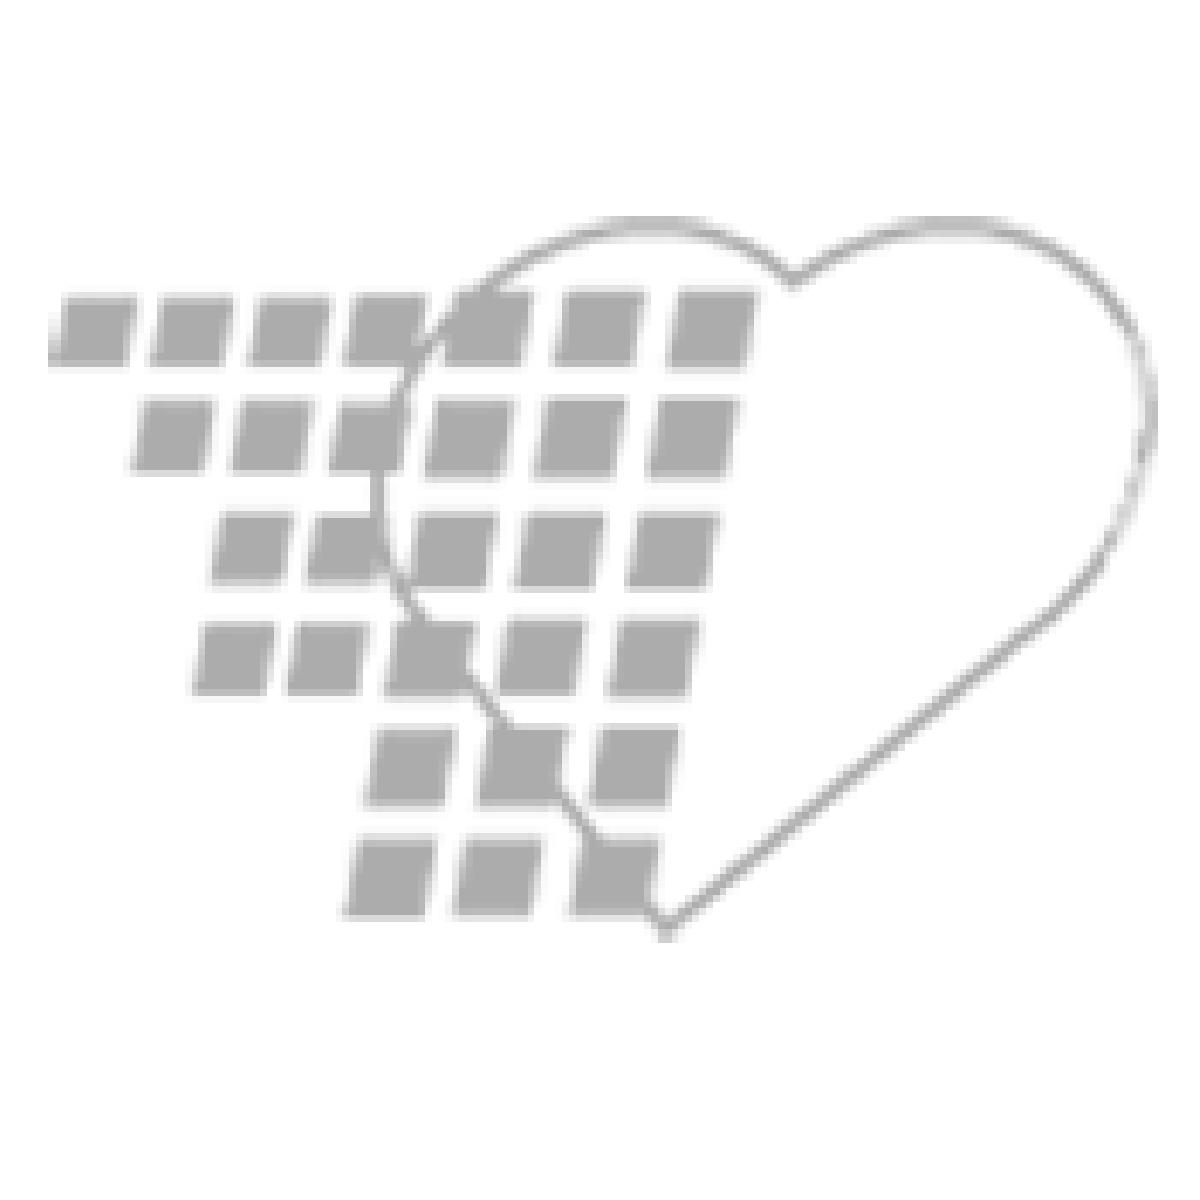 14-17-0729 - Nasco Life/form® Simulated Burns Complete Set